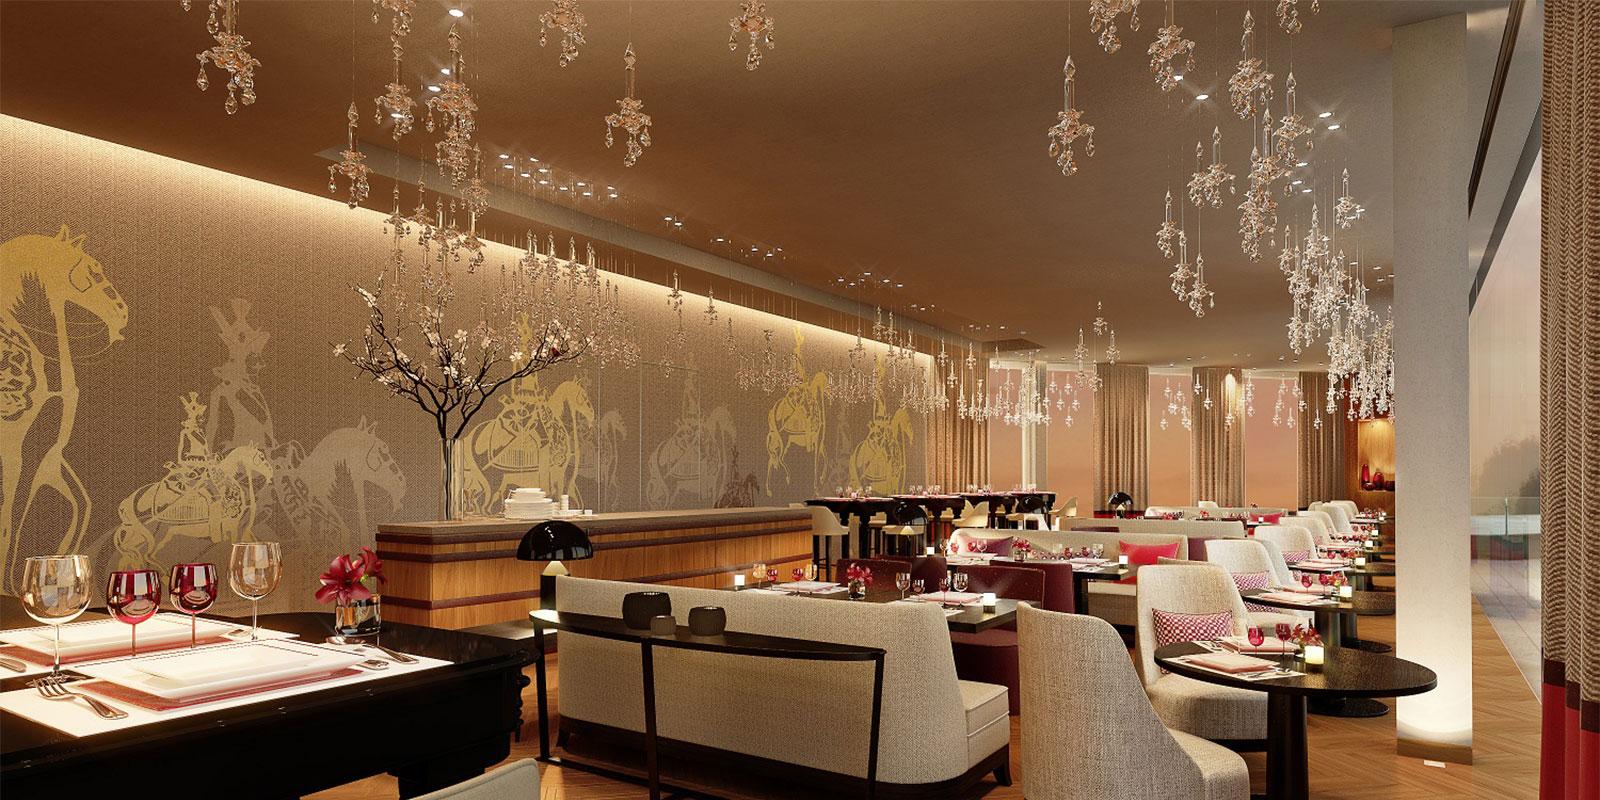 Ambiance musicale pour le restaurant Royal Champagne